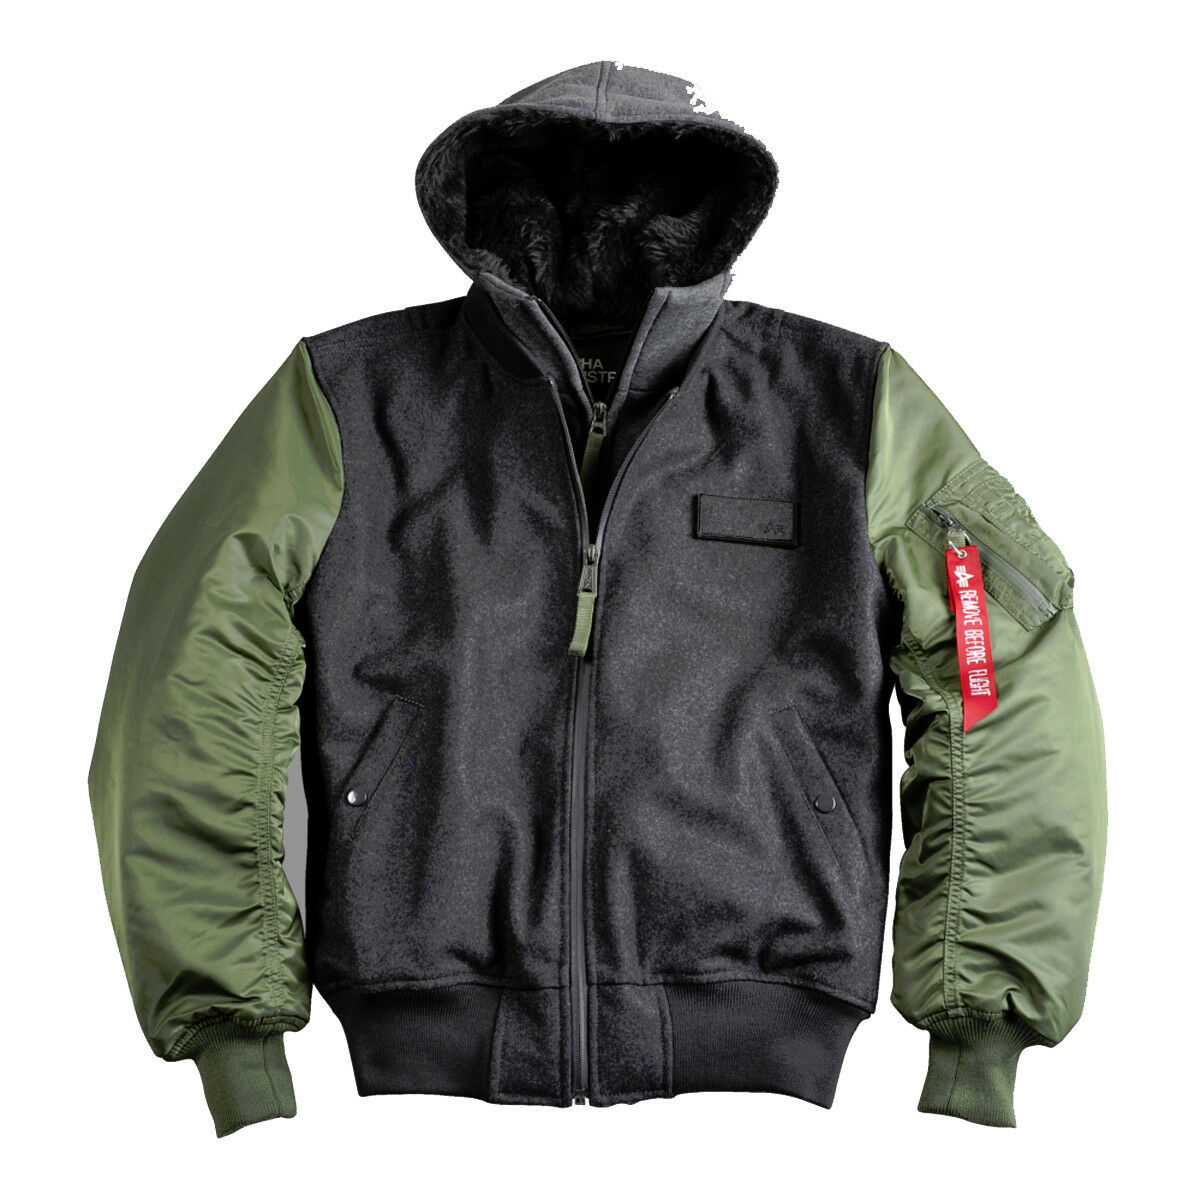 Alpha Industries veste ma-1 D-tec wool aviateur veste vestes Bomber veste Industries hommes capuche 15bde7